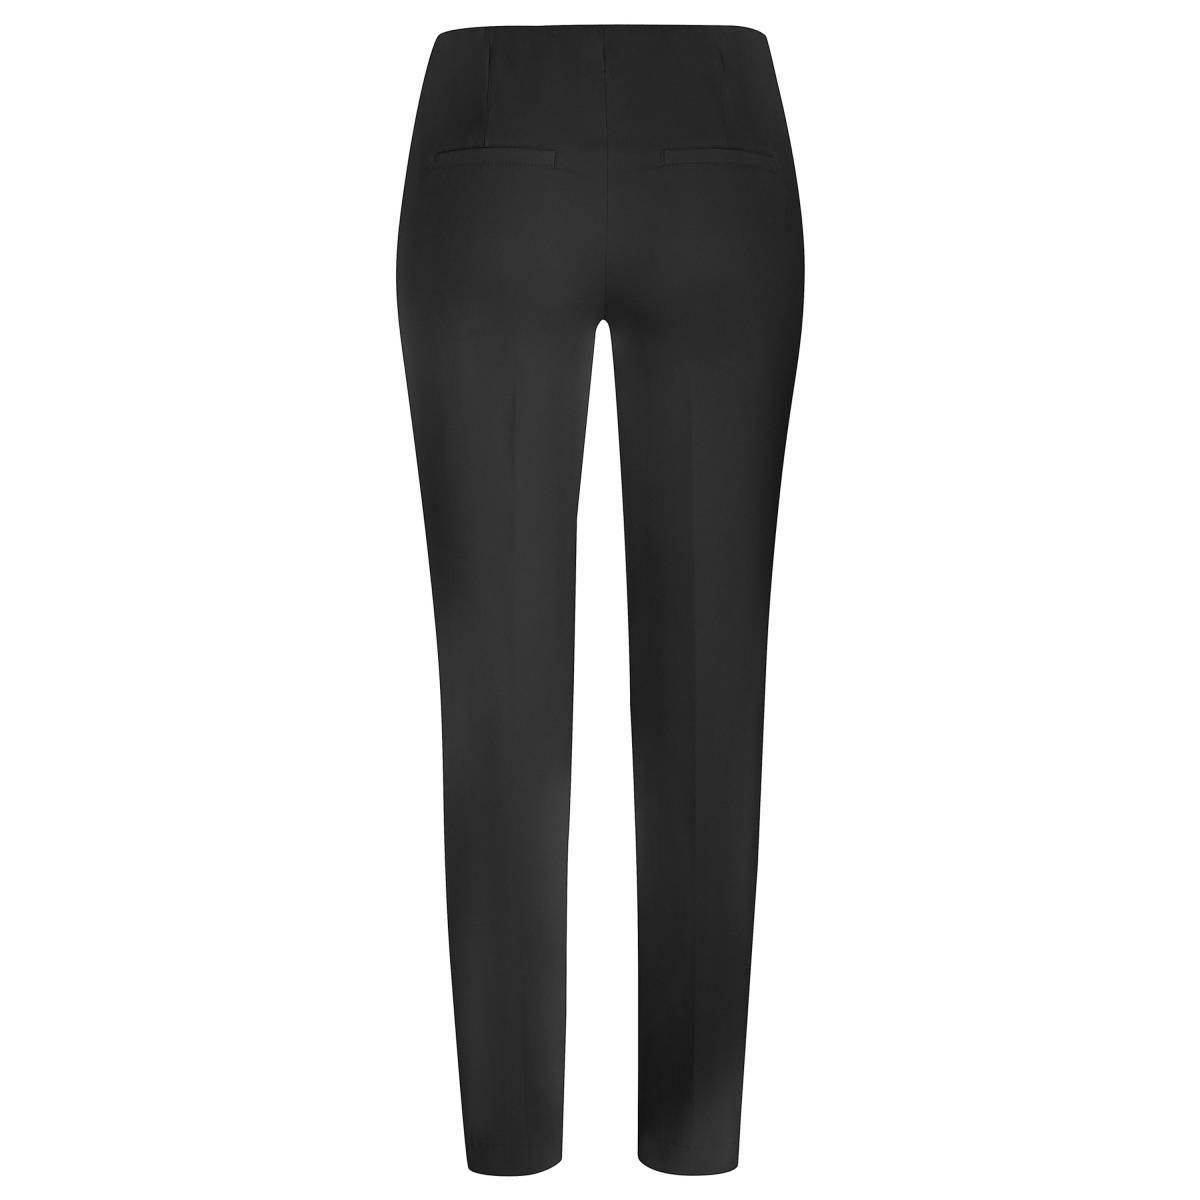 CAMBIO pantalon ros L29-6